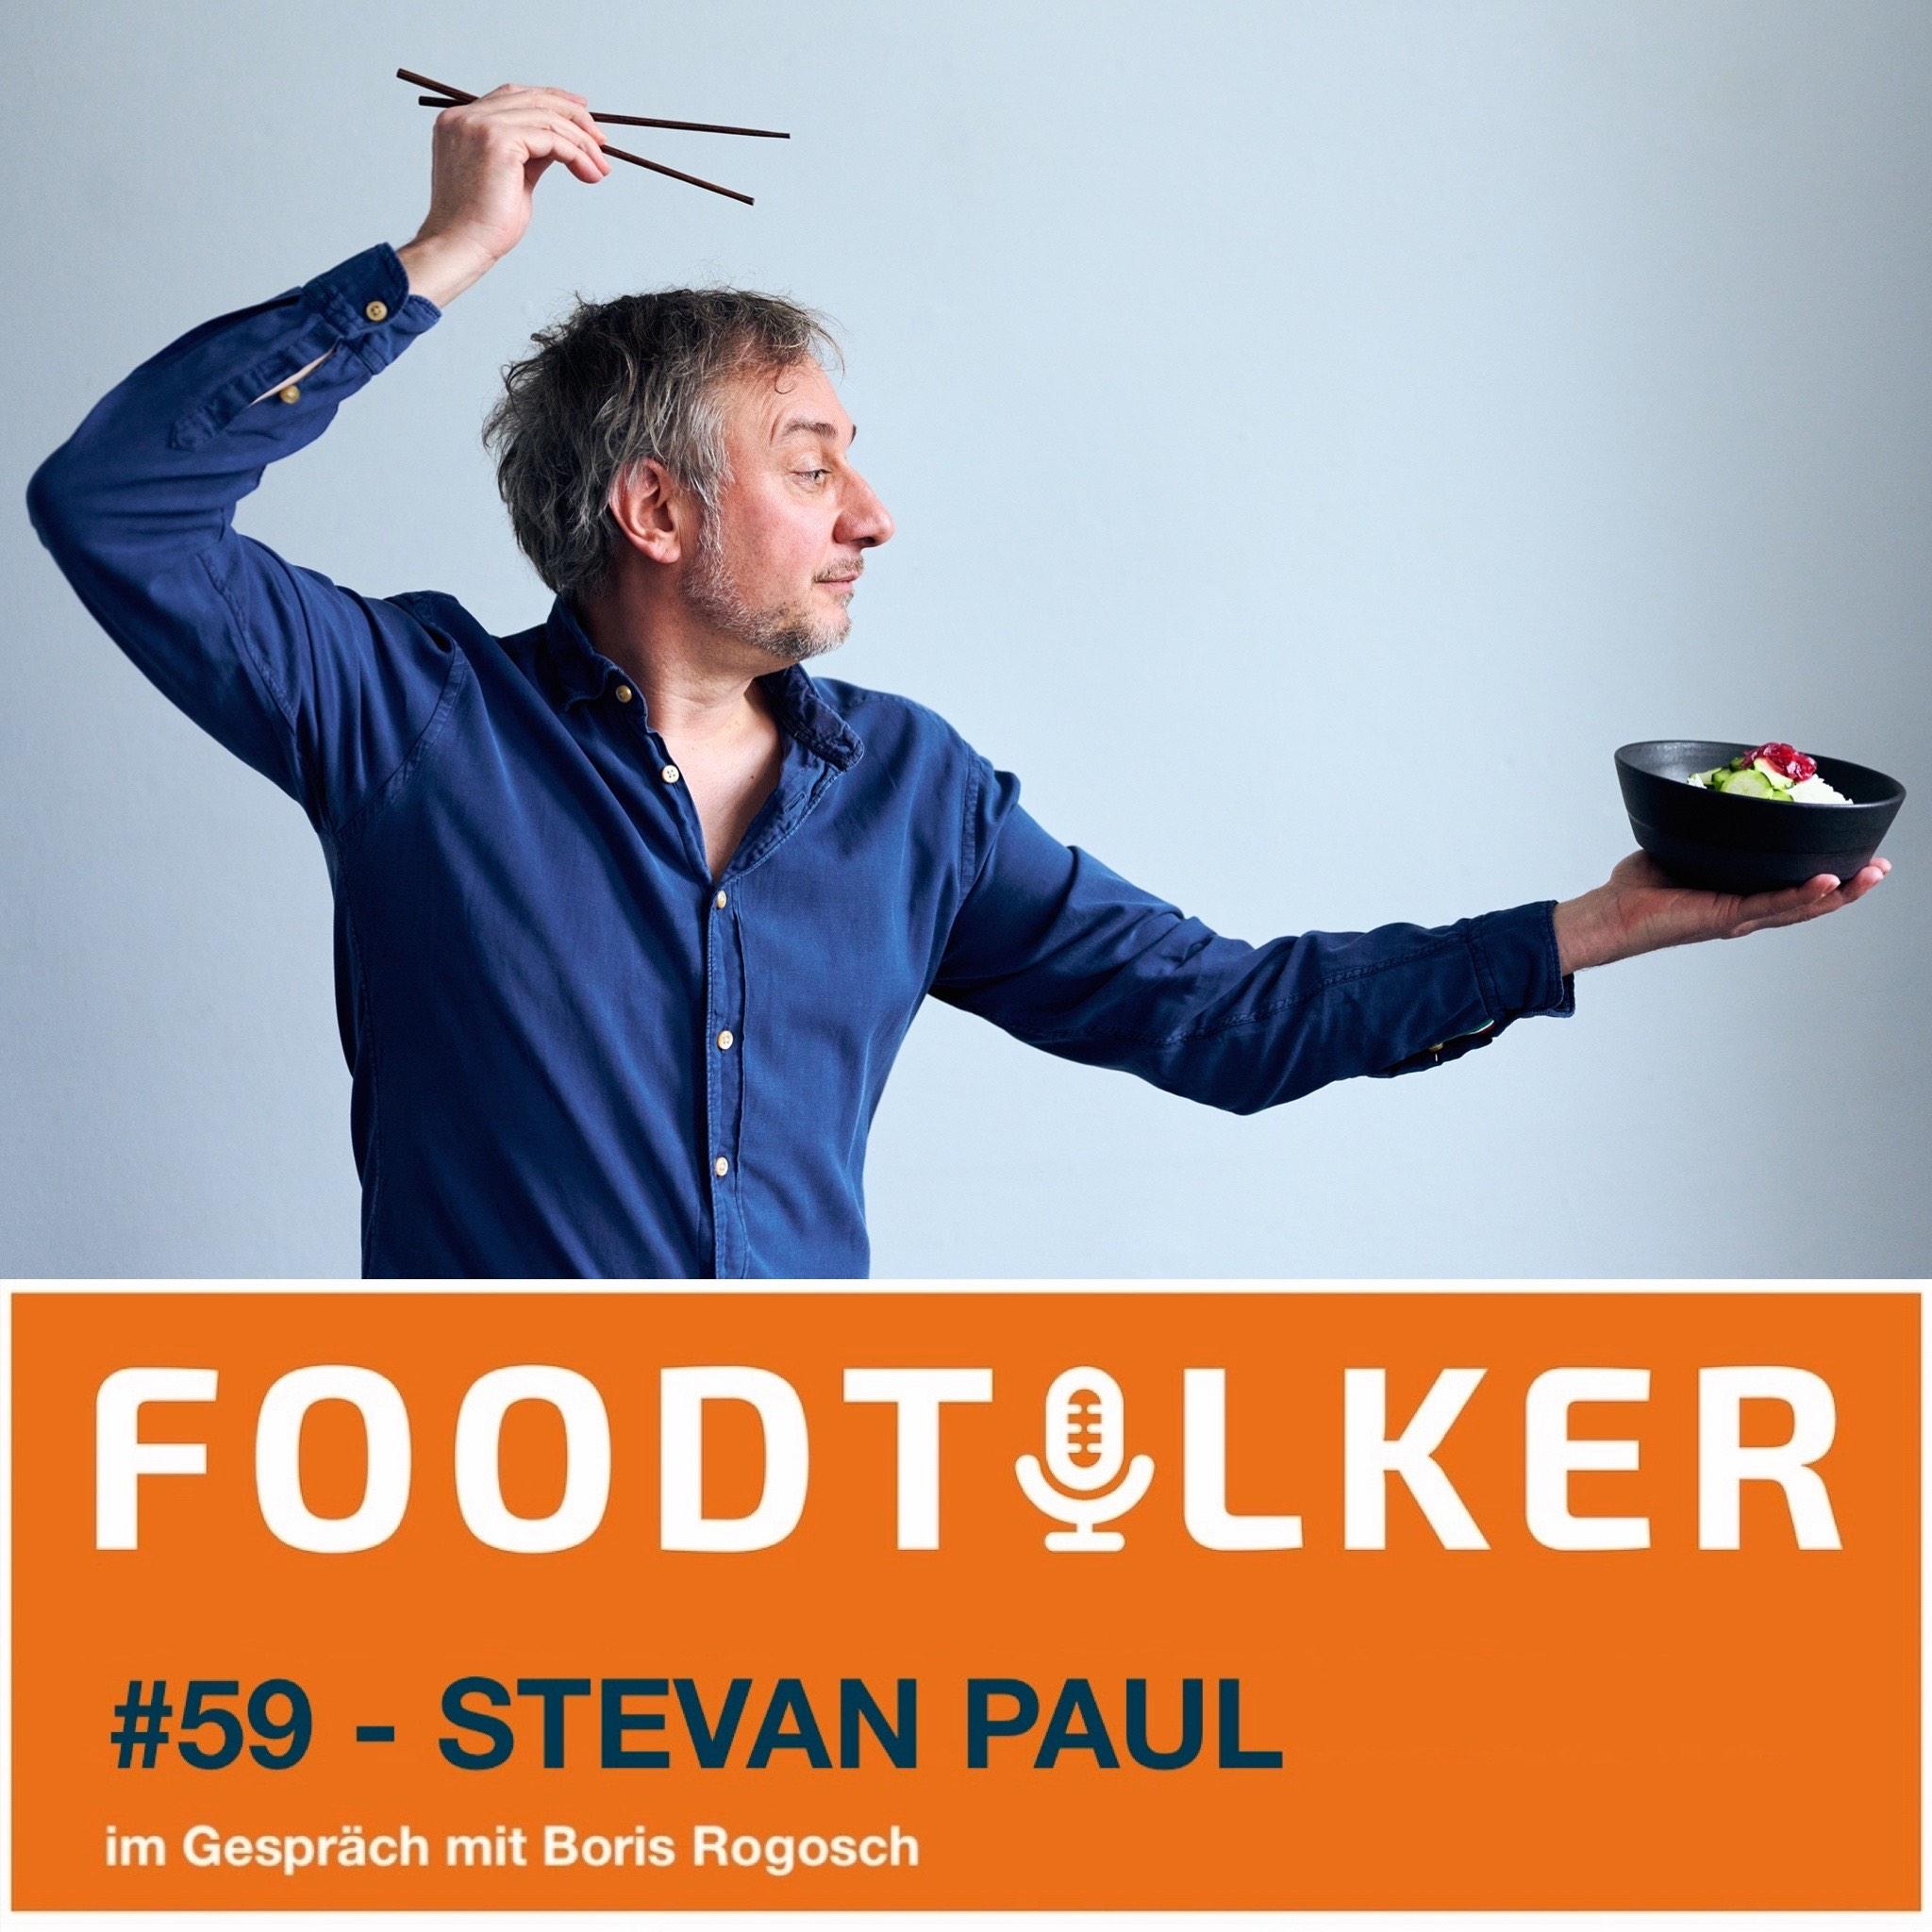 Stevan Paul - Kochbuchautor und Foodjournalist*